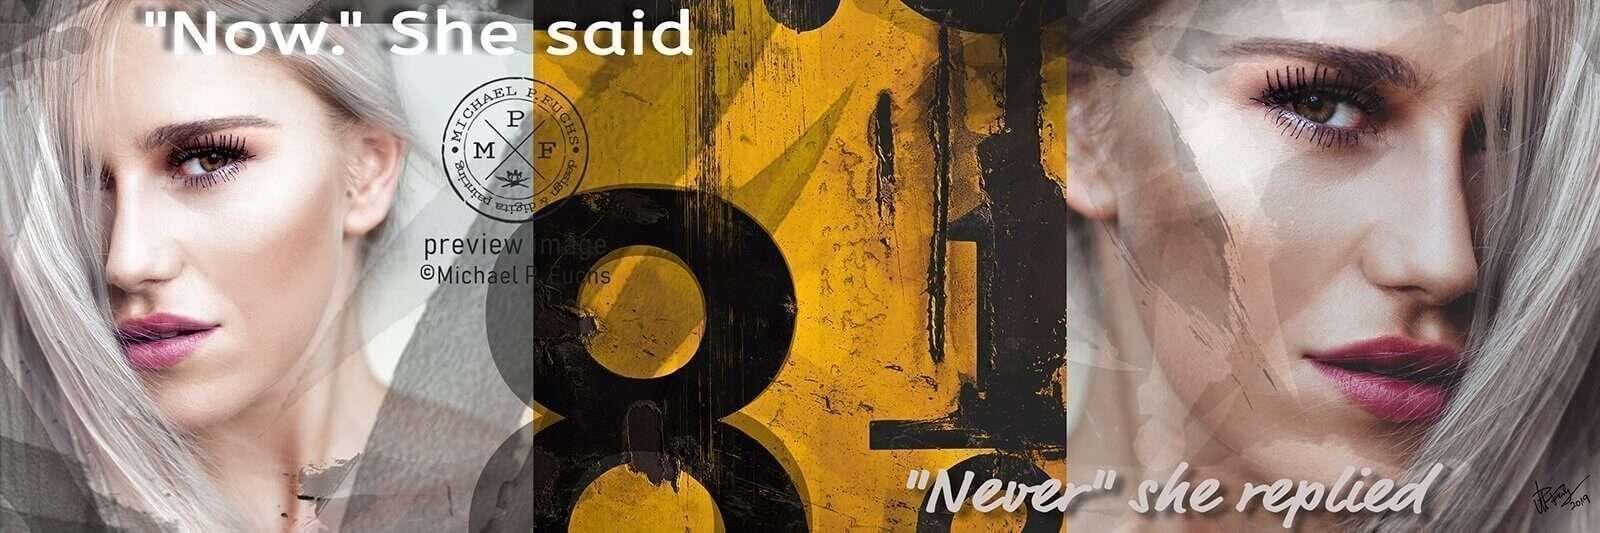 now-she-said